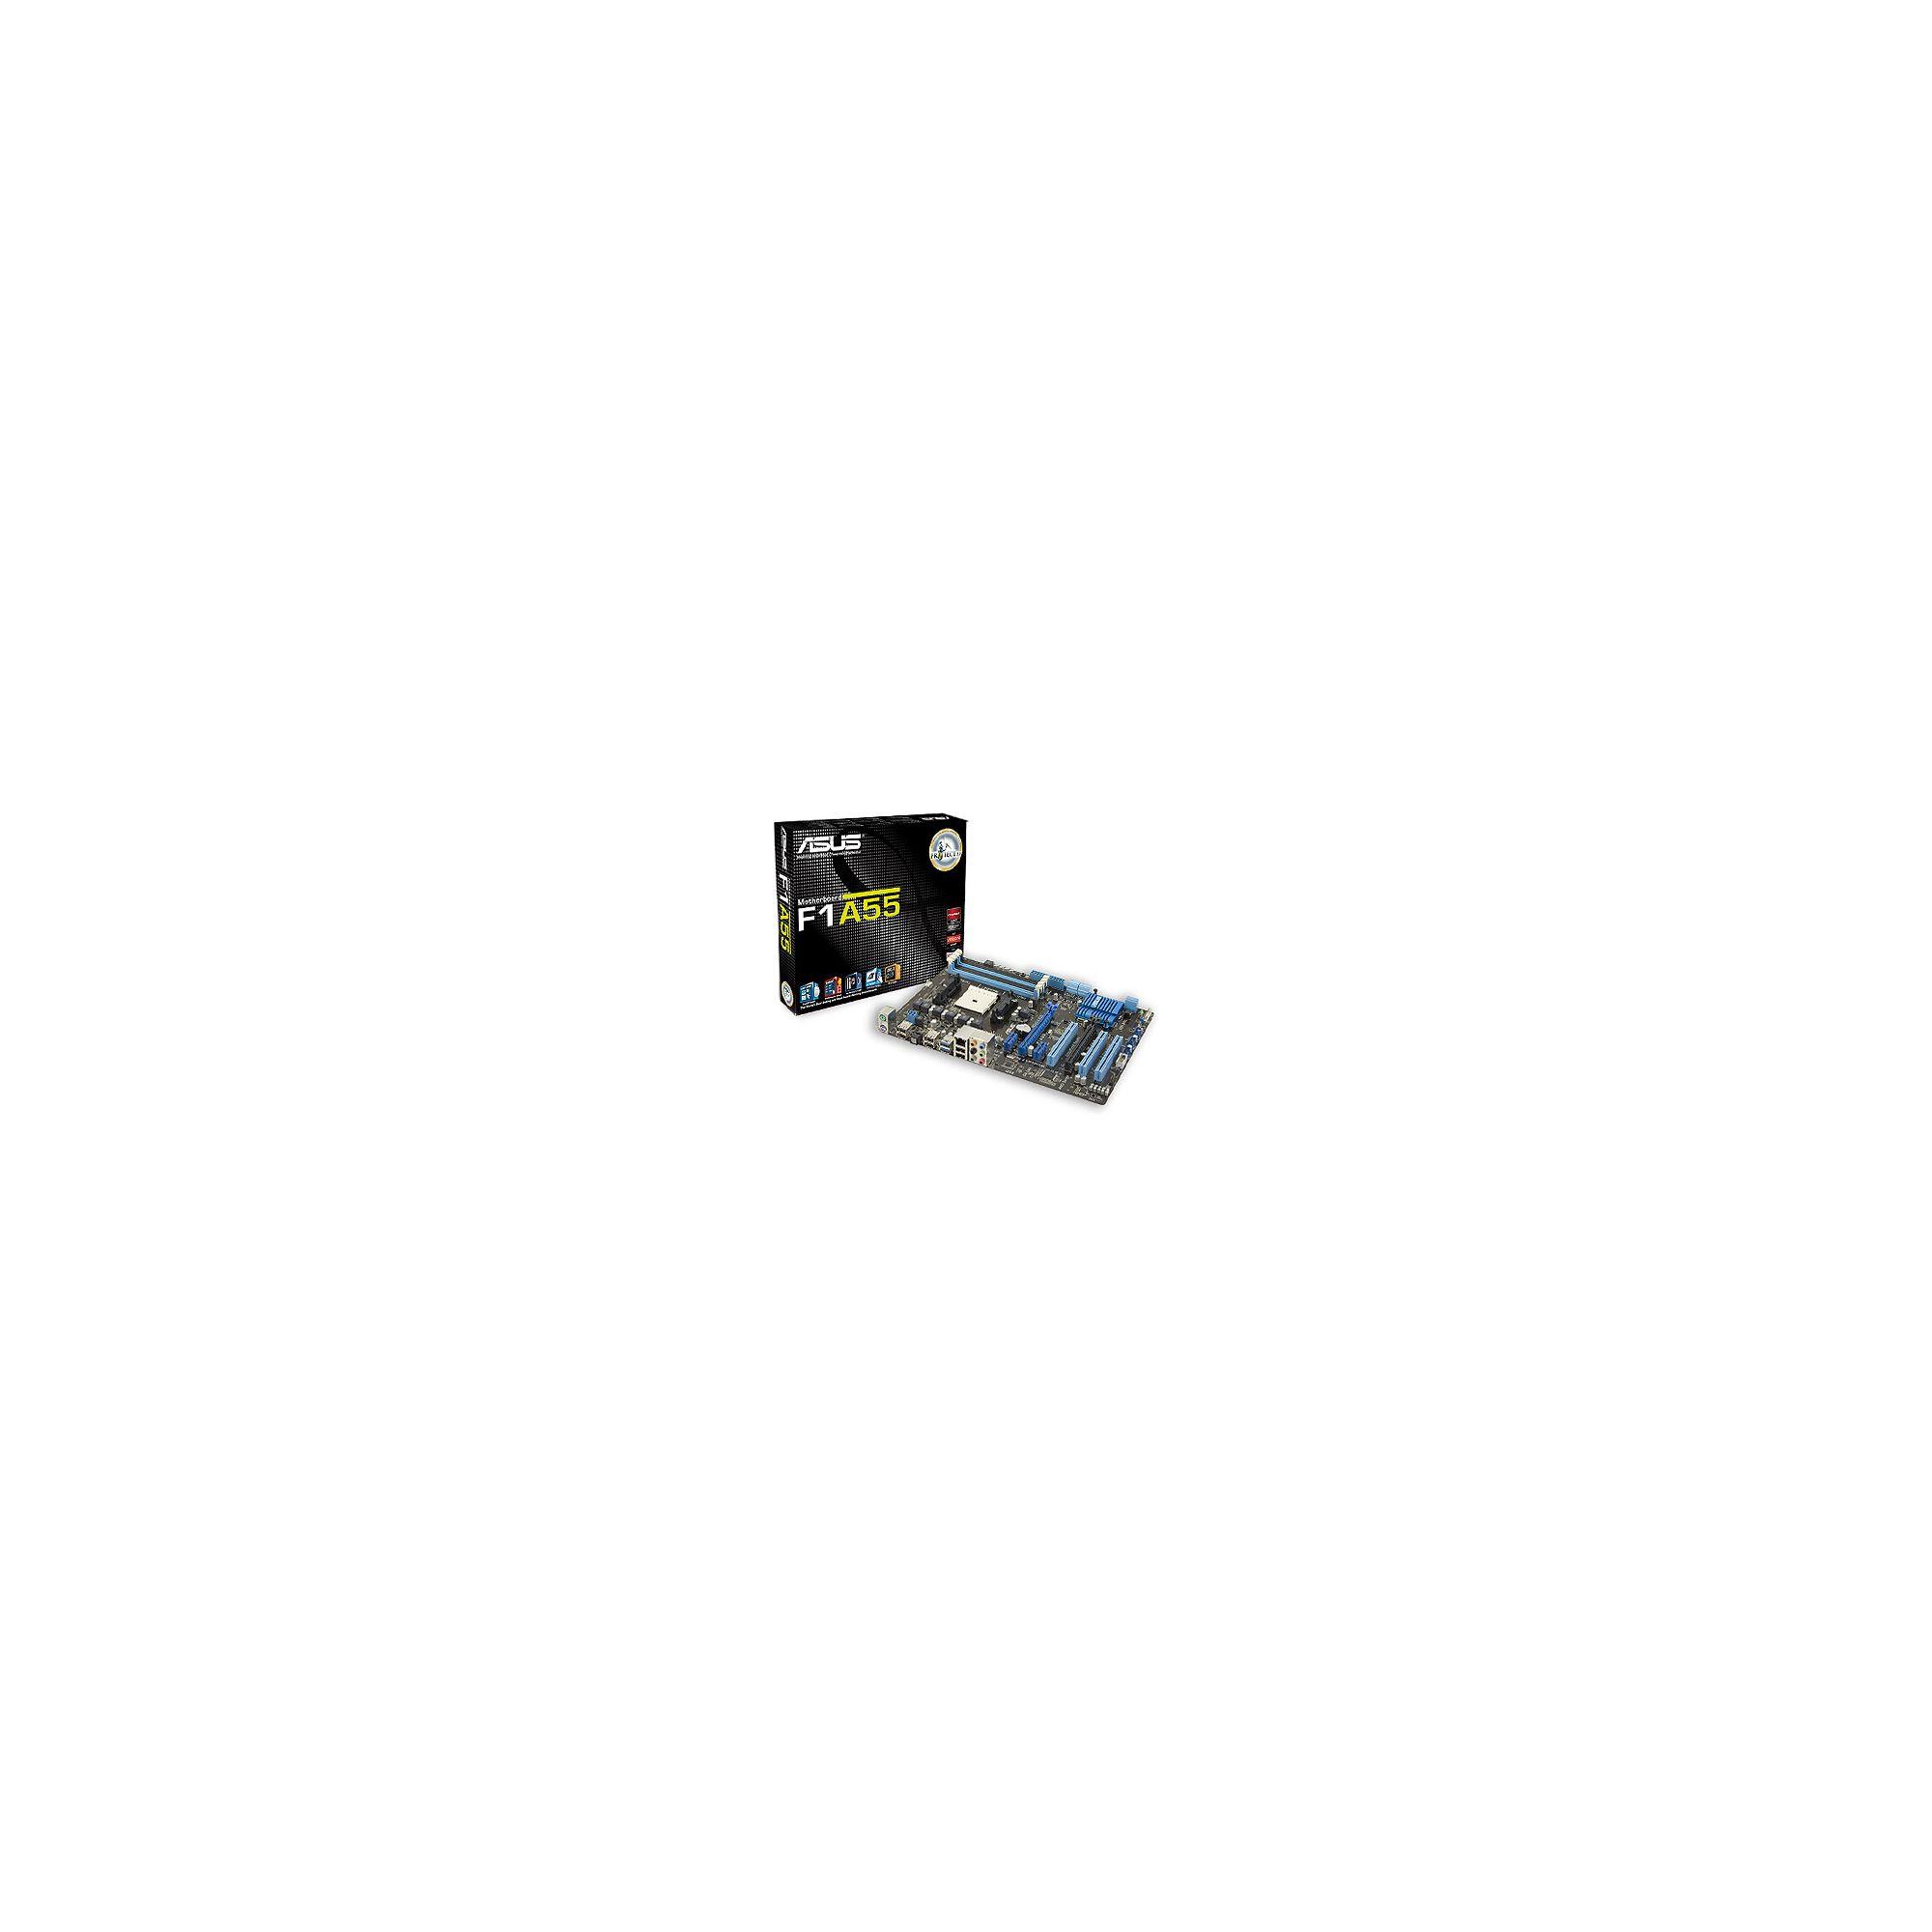 asus-f1-a55-motherboard-a-e2-socket-fm1-a55-atx-gigabit-lan